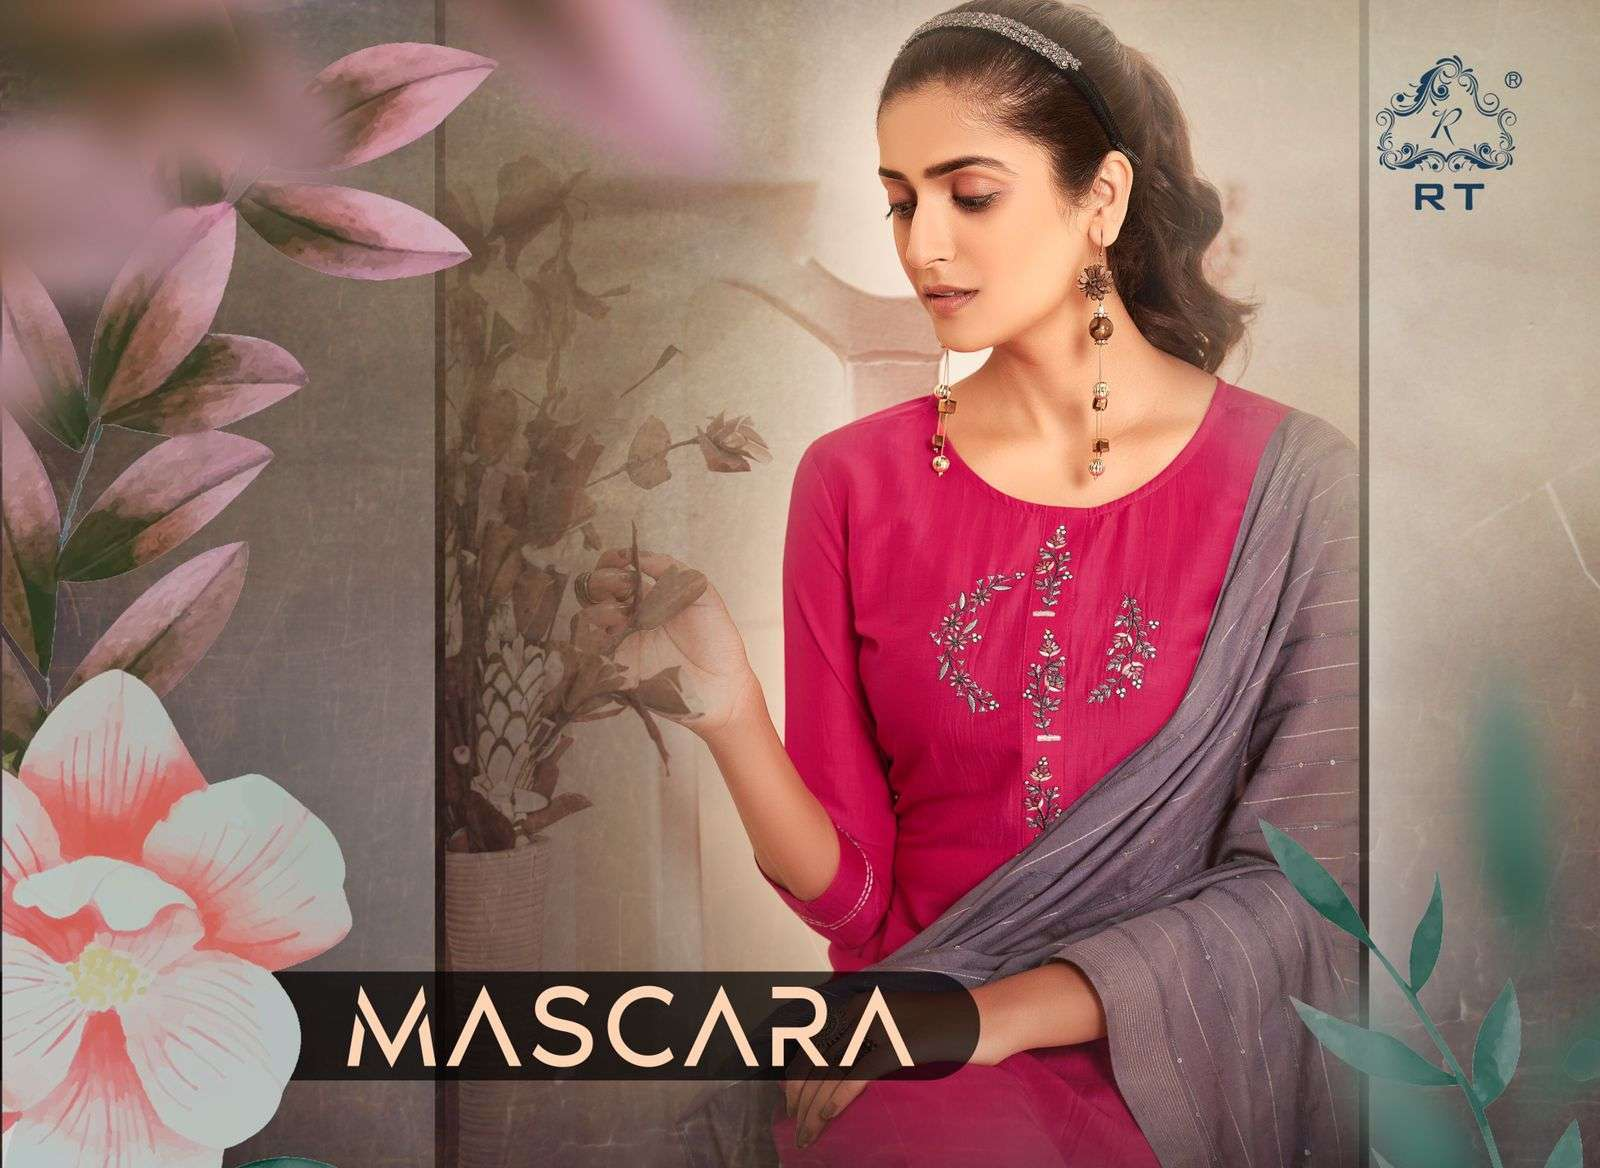 Mascara Readymade Fancy Kurti With Bottom And Dupatta By Rijiya Trends